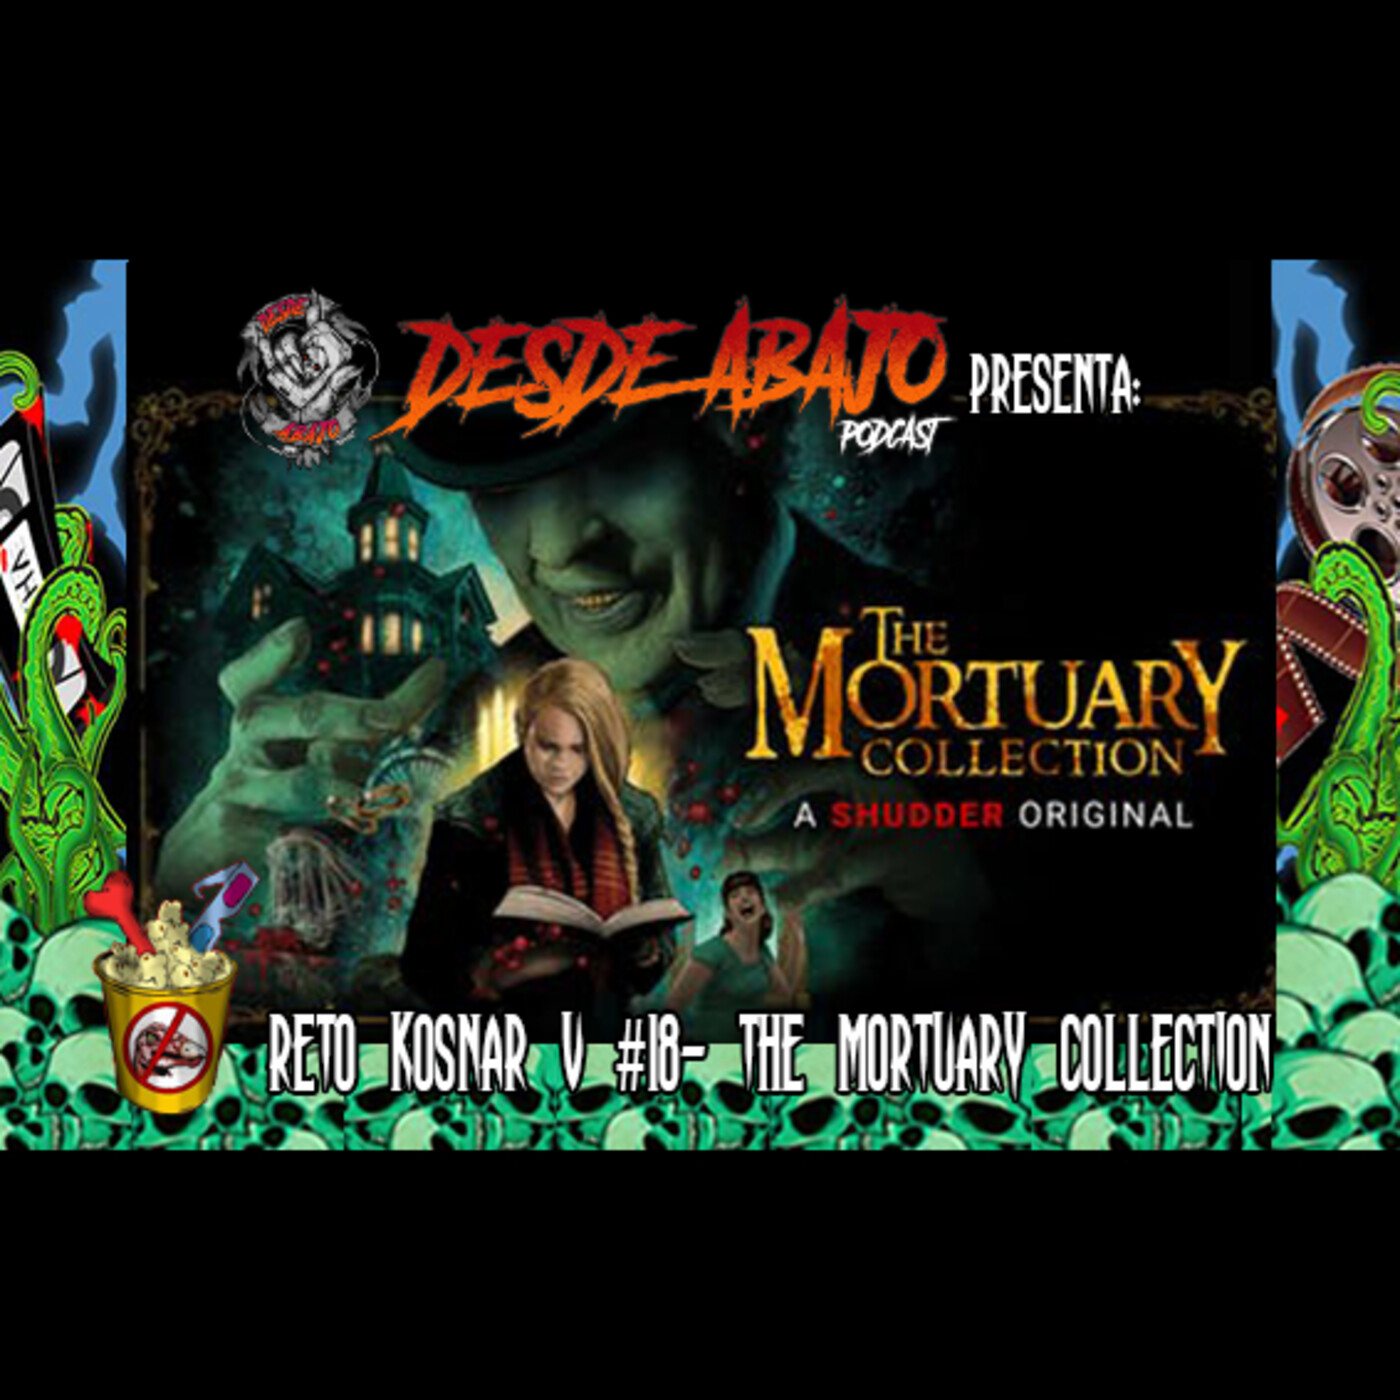 Reto Kosnar V #18- The Mortuary Collection